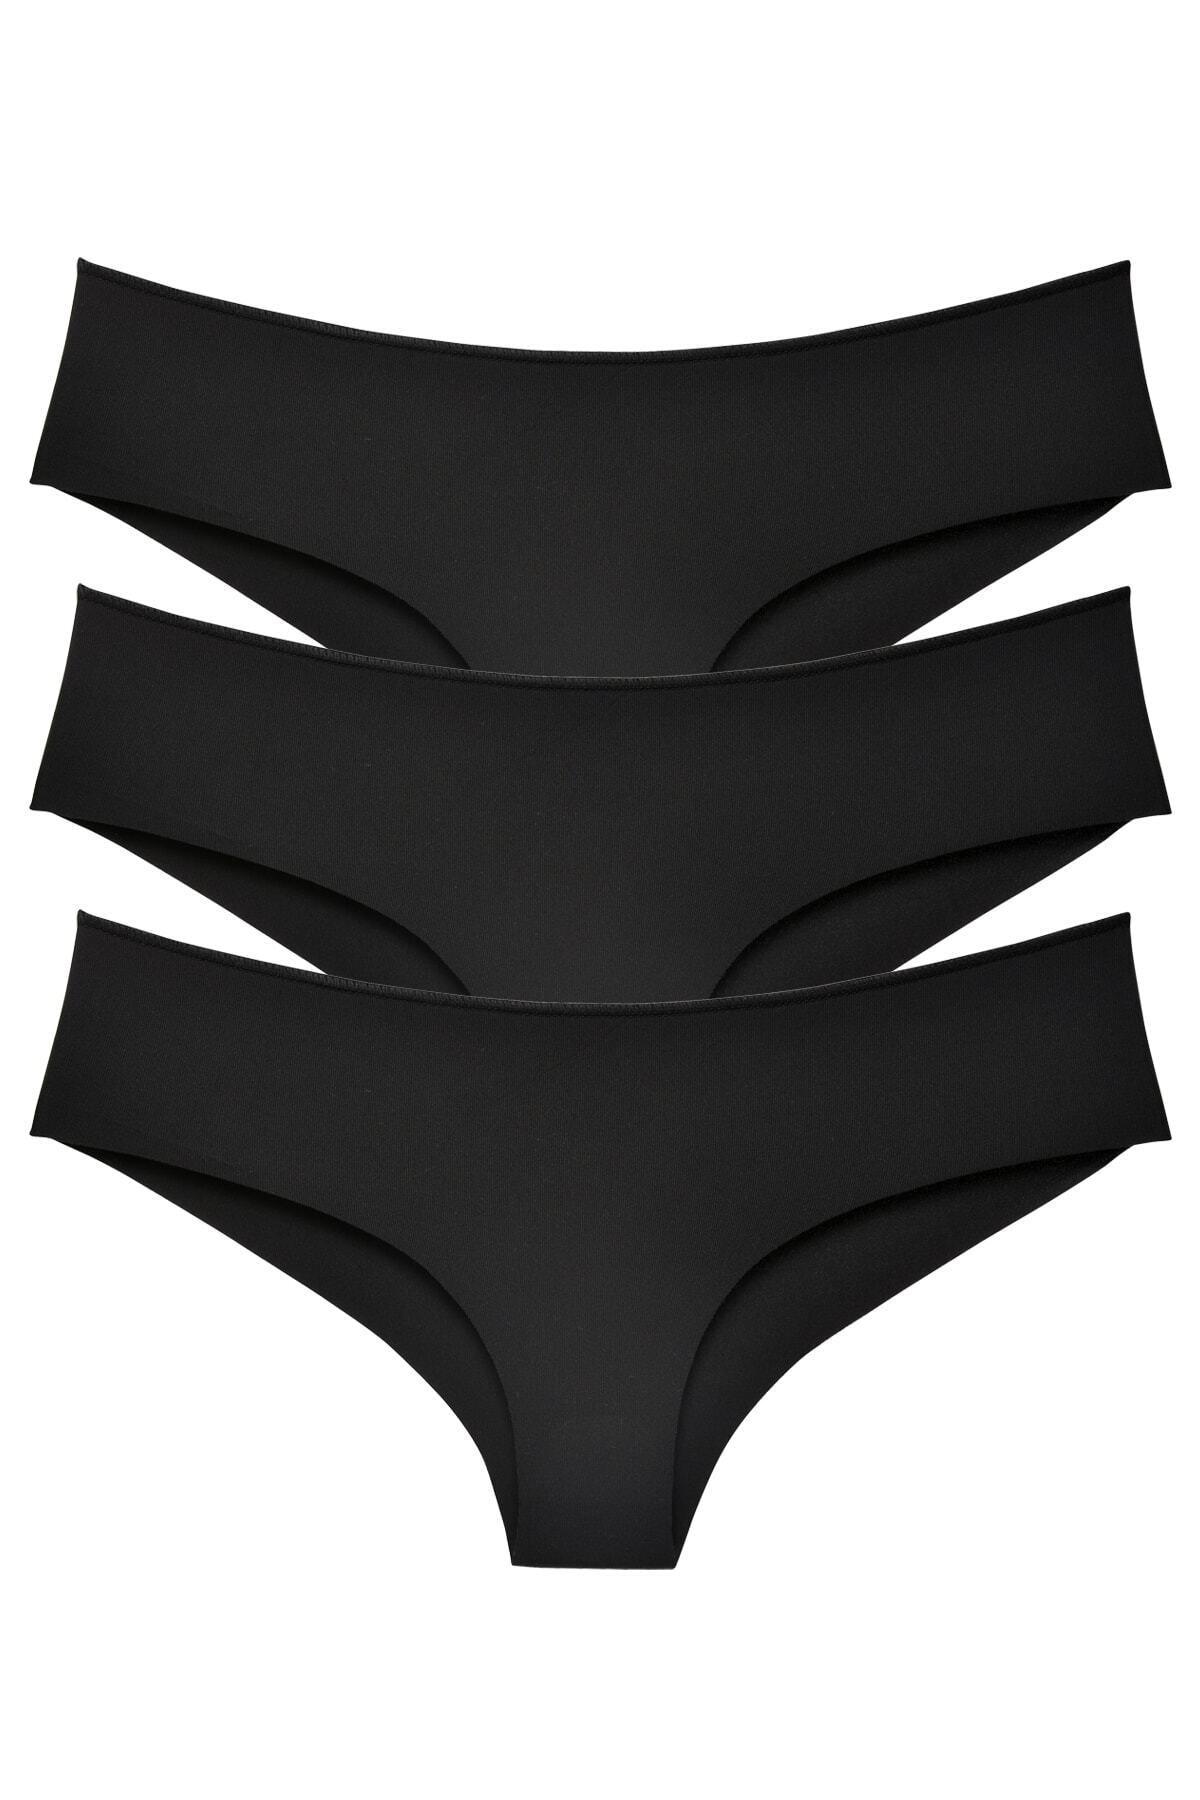 Sensu Kadın Siyah Brazilian Panty Lazer Kesim Külot 3'lü Paket Set 1